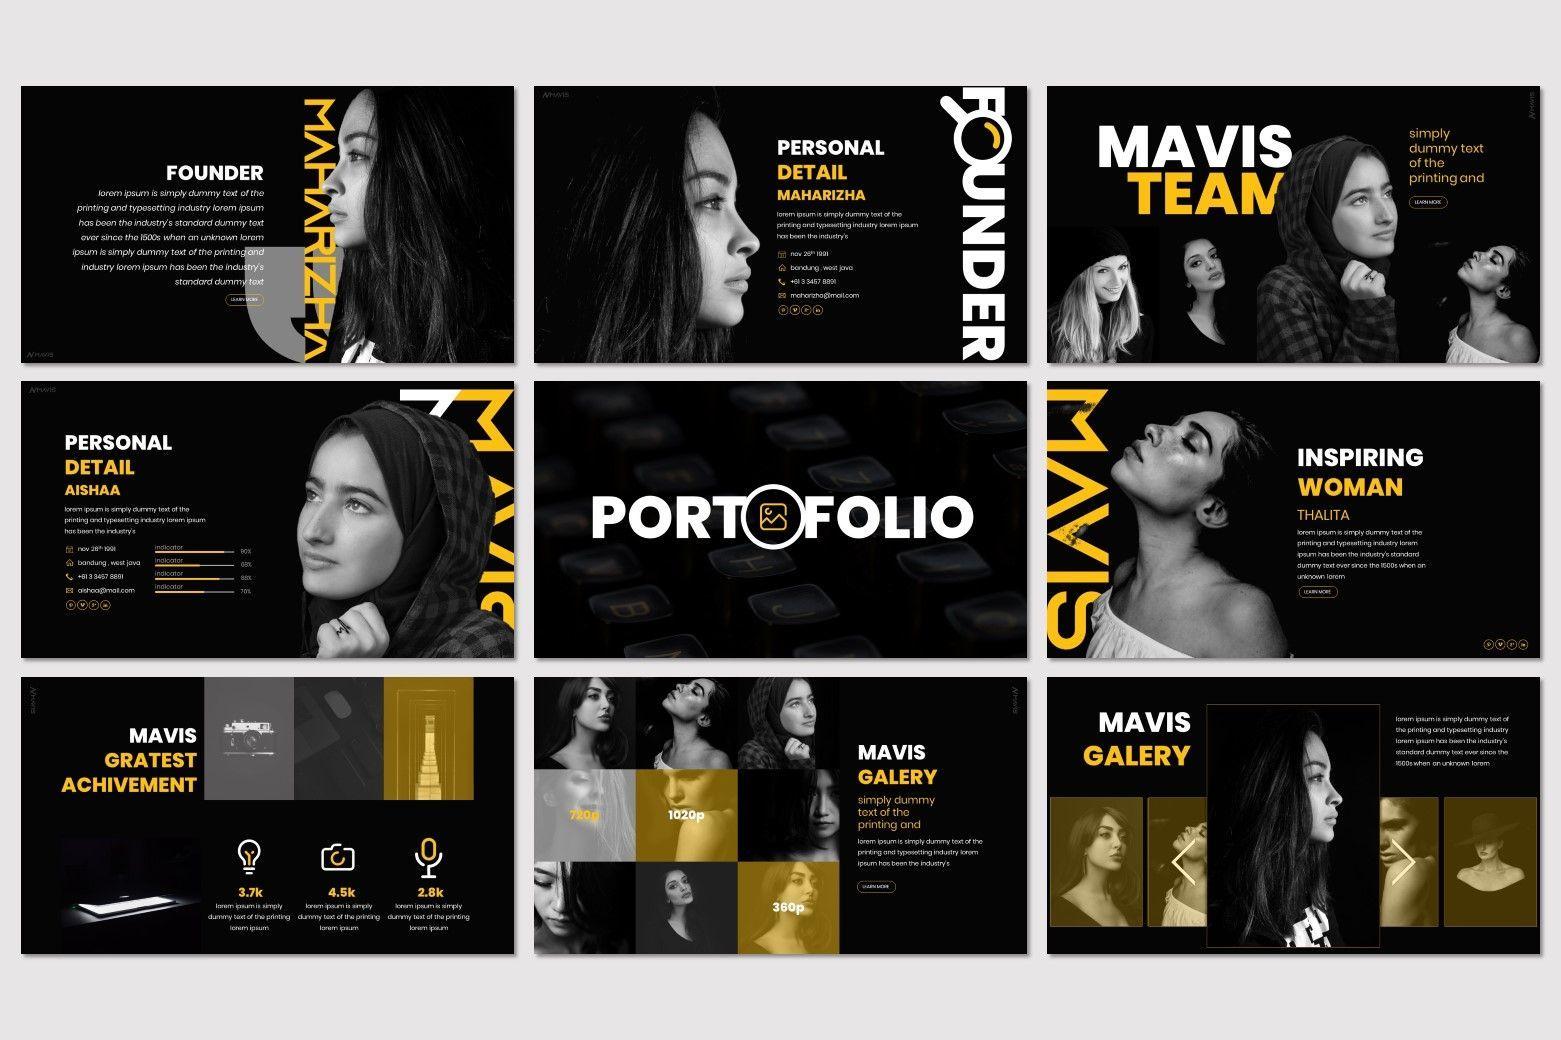 Mavis - PowerPoint Template, Slide 4, 07266, Presentation Templates — PoweredTemplate.com